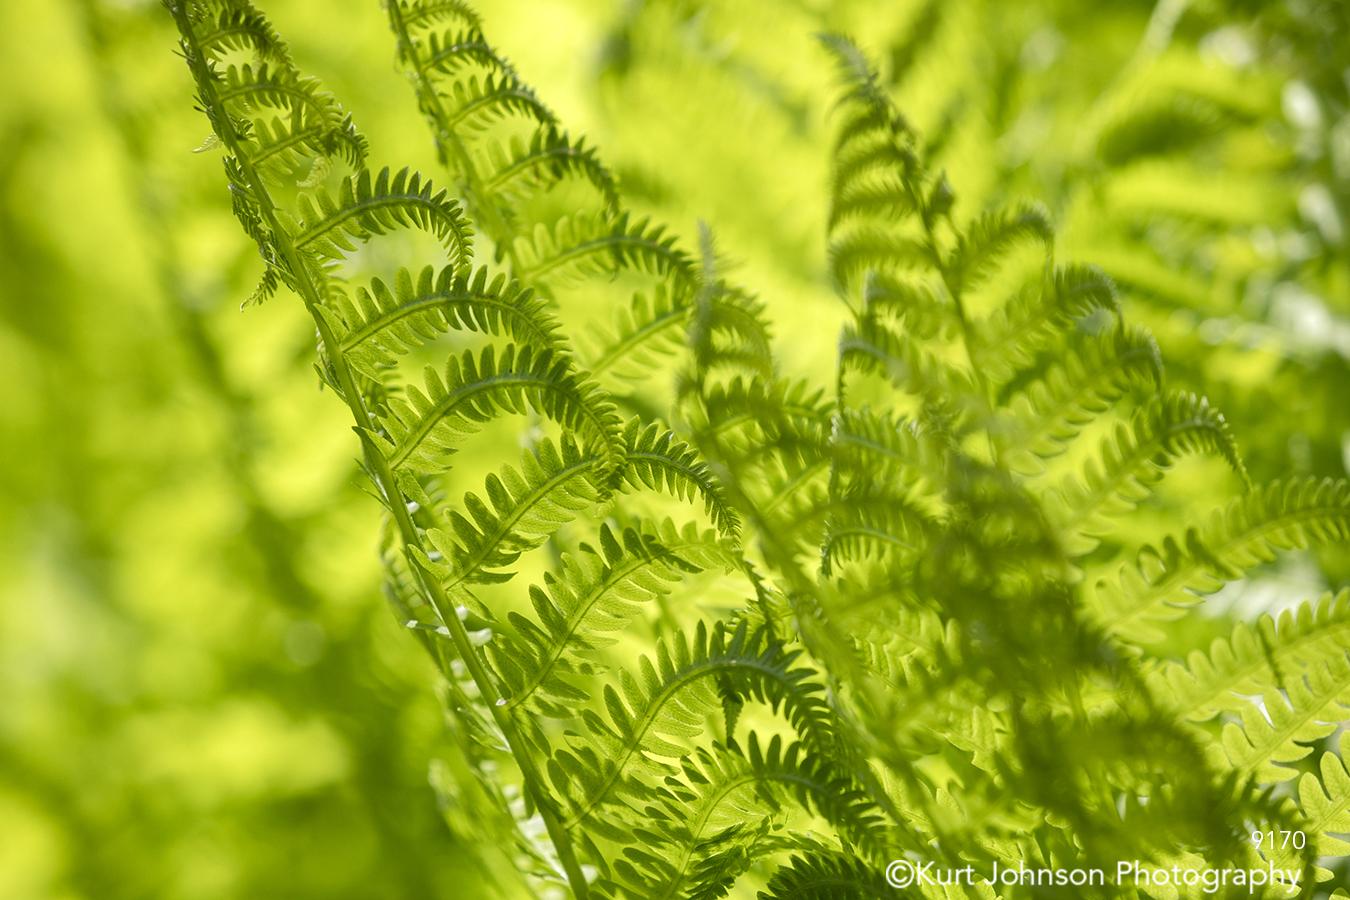 green yellow fern leaves pattern texture